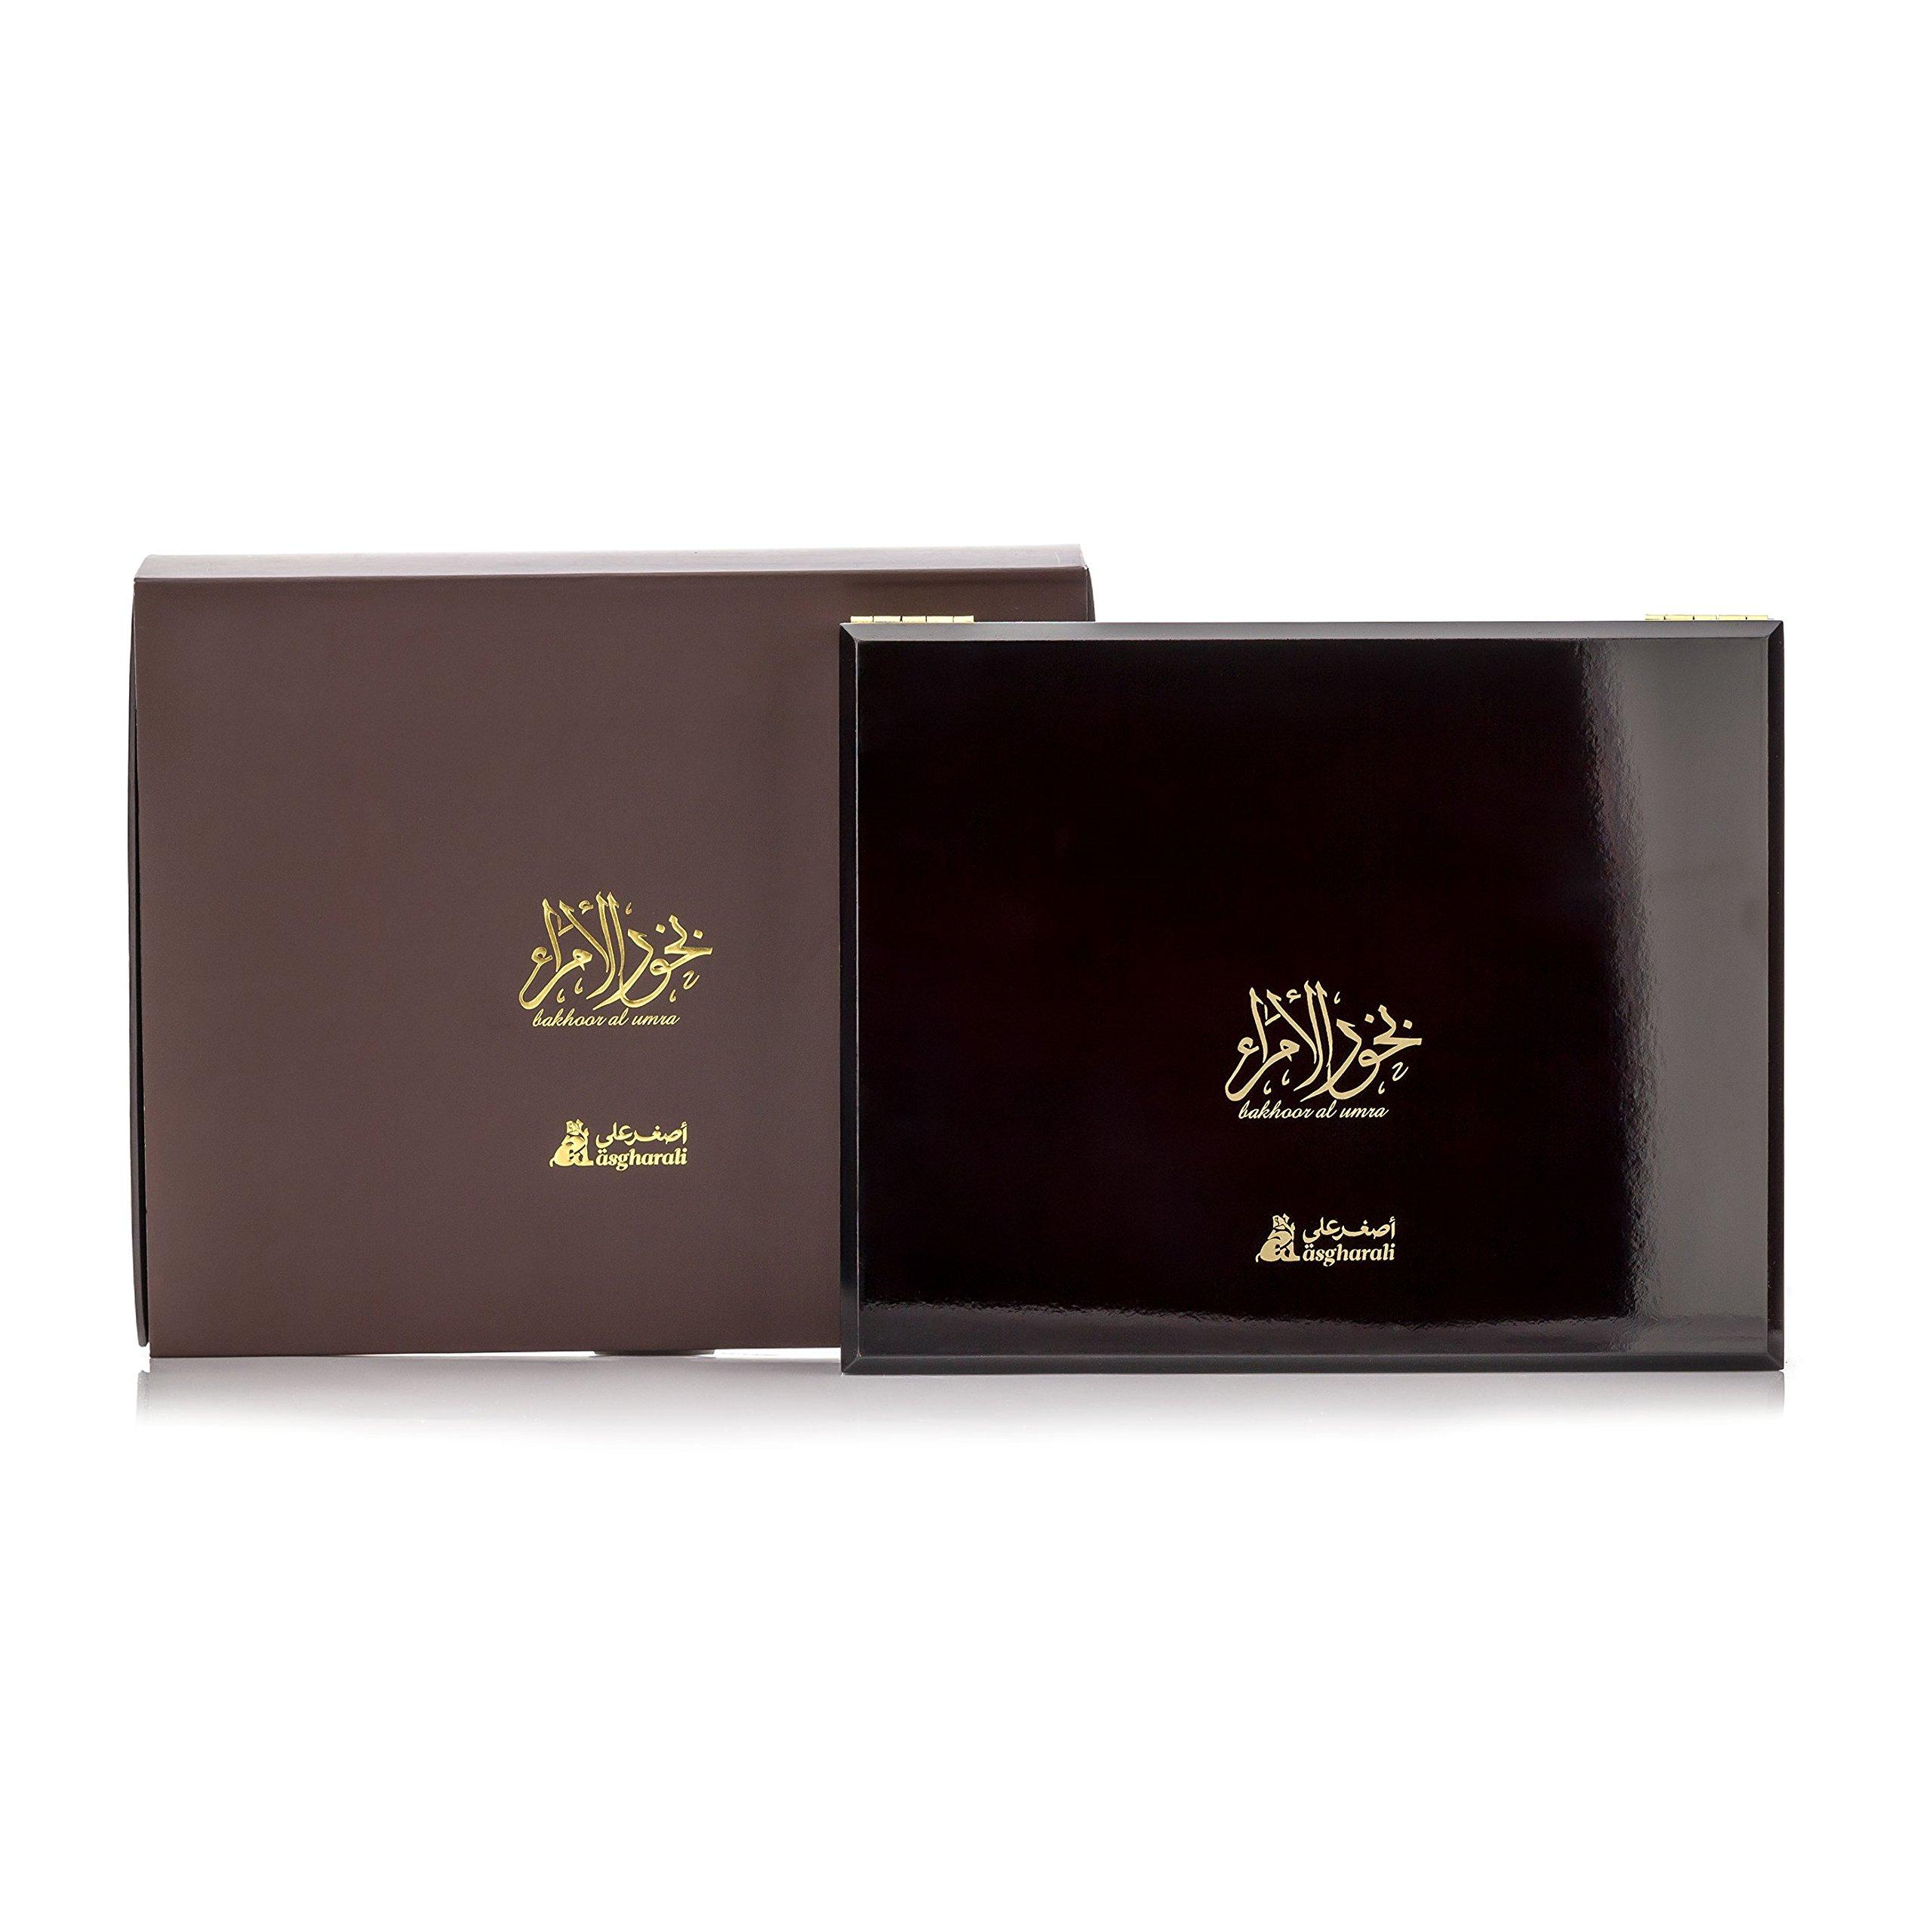 BAKHOOR AL UMRA 240gm Asgharali Arabic Incense, Agarwood Oudh, Woody Vanilla Spicy, Room Fragrance by Asgharali BAKHOOR AL UMRA (Image #3)